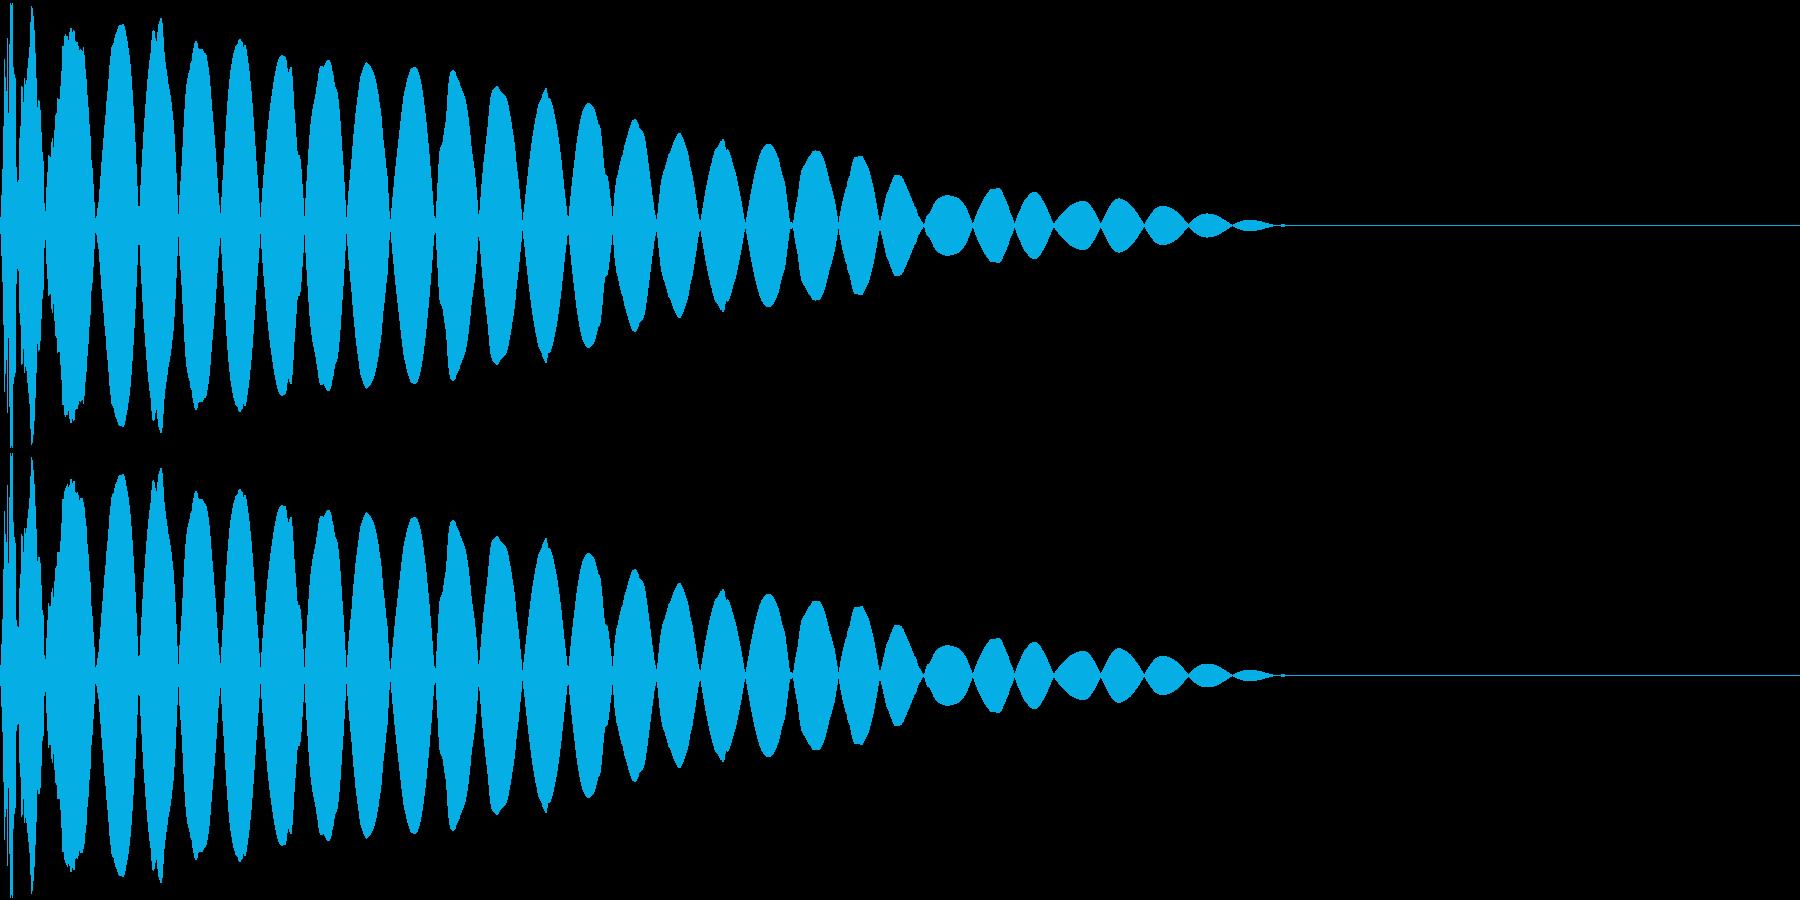 DTM Kick 94 オリジナル音源の再生済みの波形